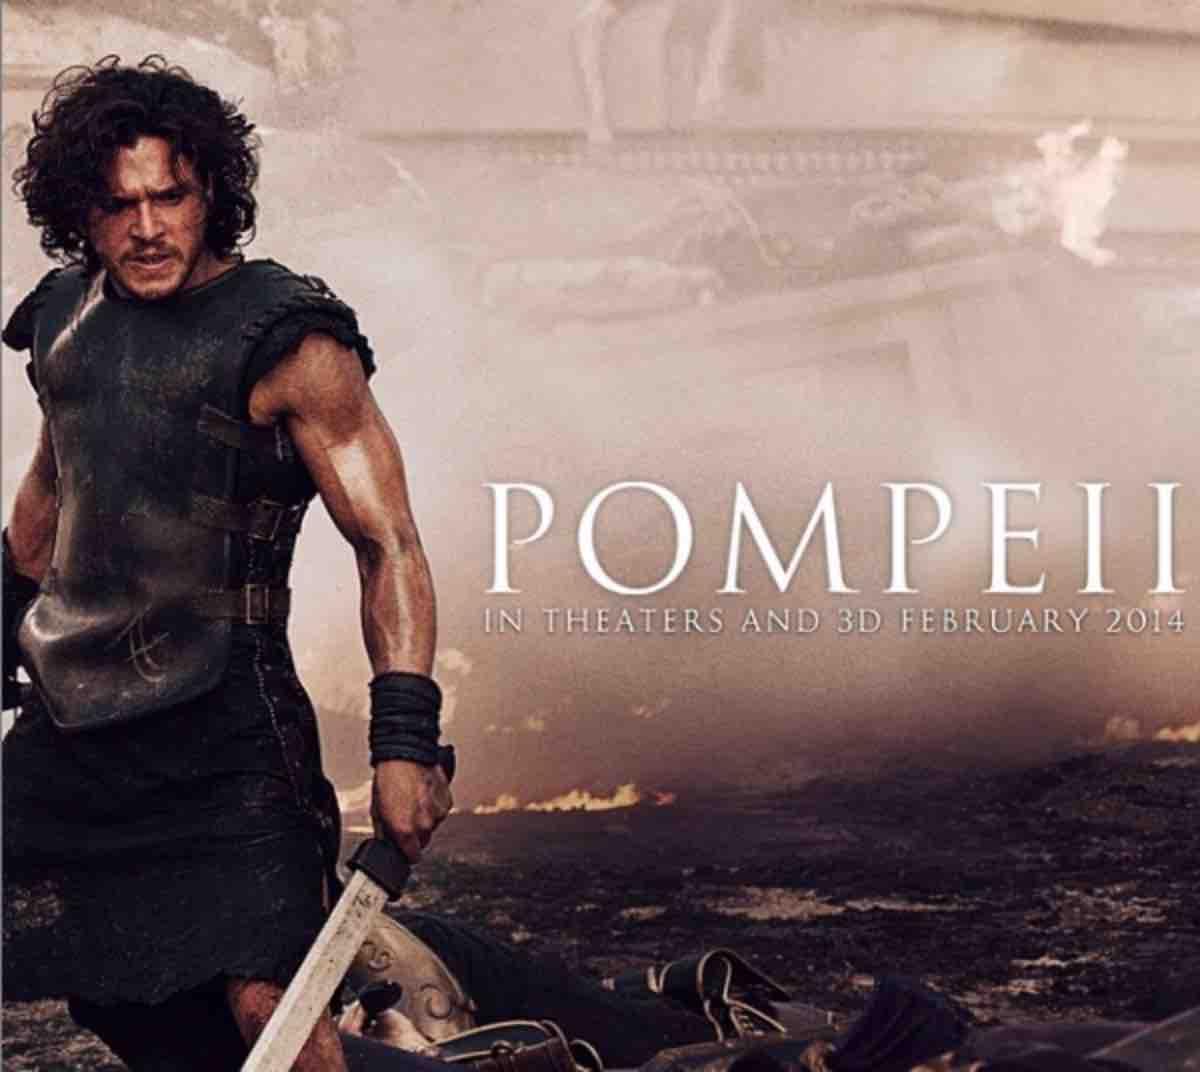 Pompei: trama   cast   trailer   curiosità del film con Kit Harington